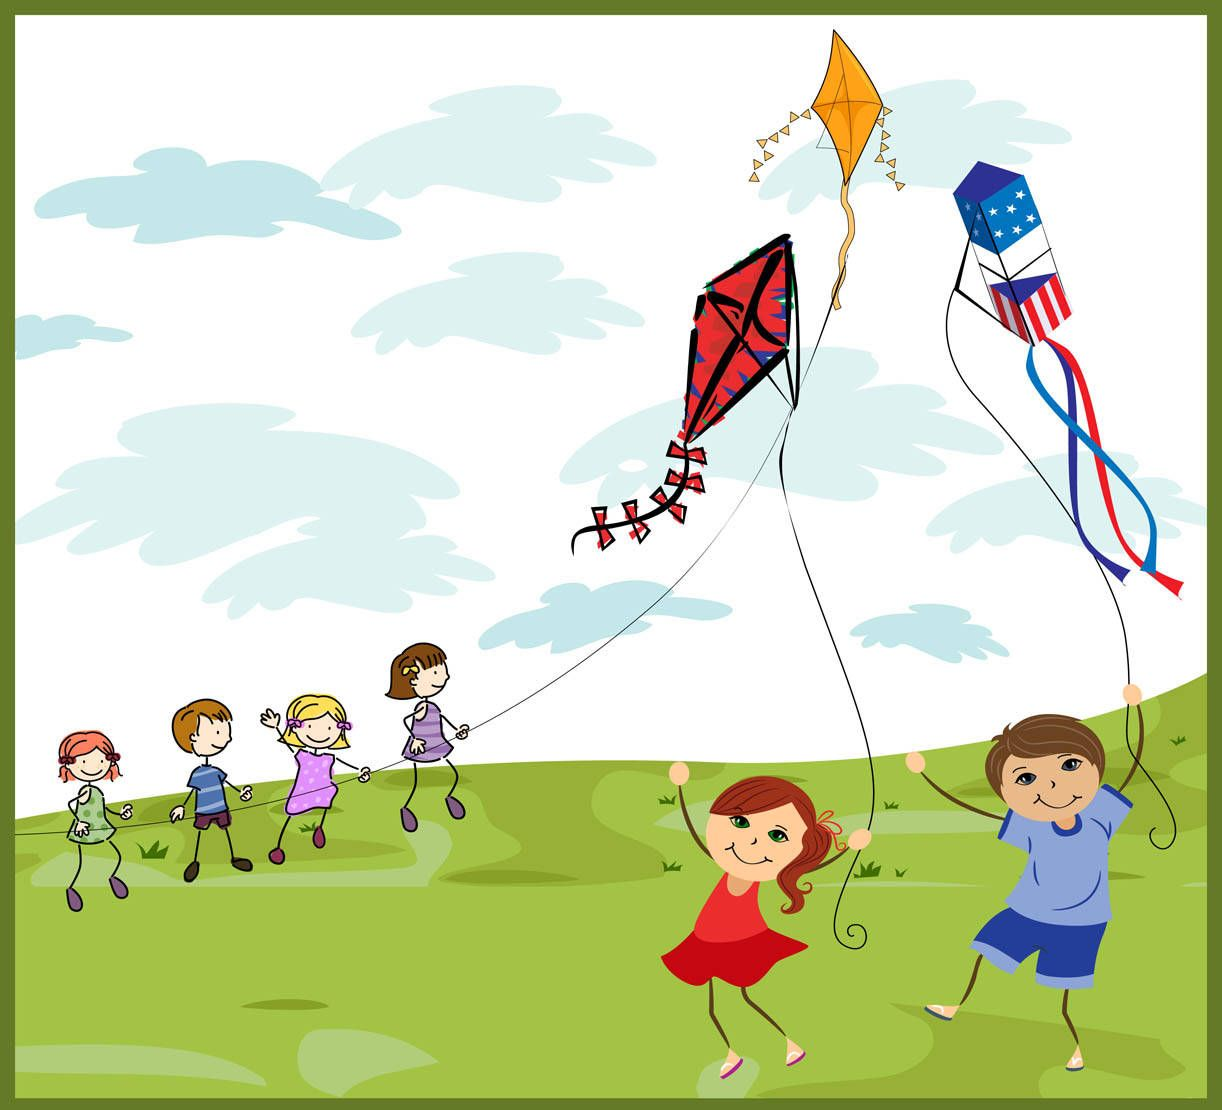 Kites Clip Art Go Fly A Kite Kite Kite Flying